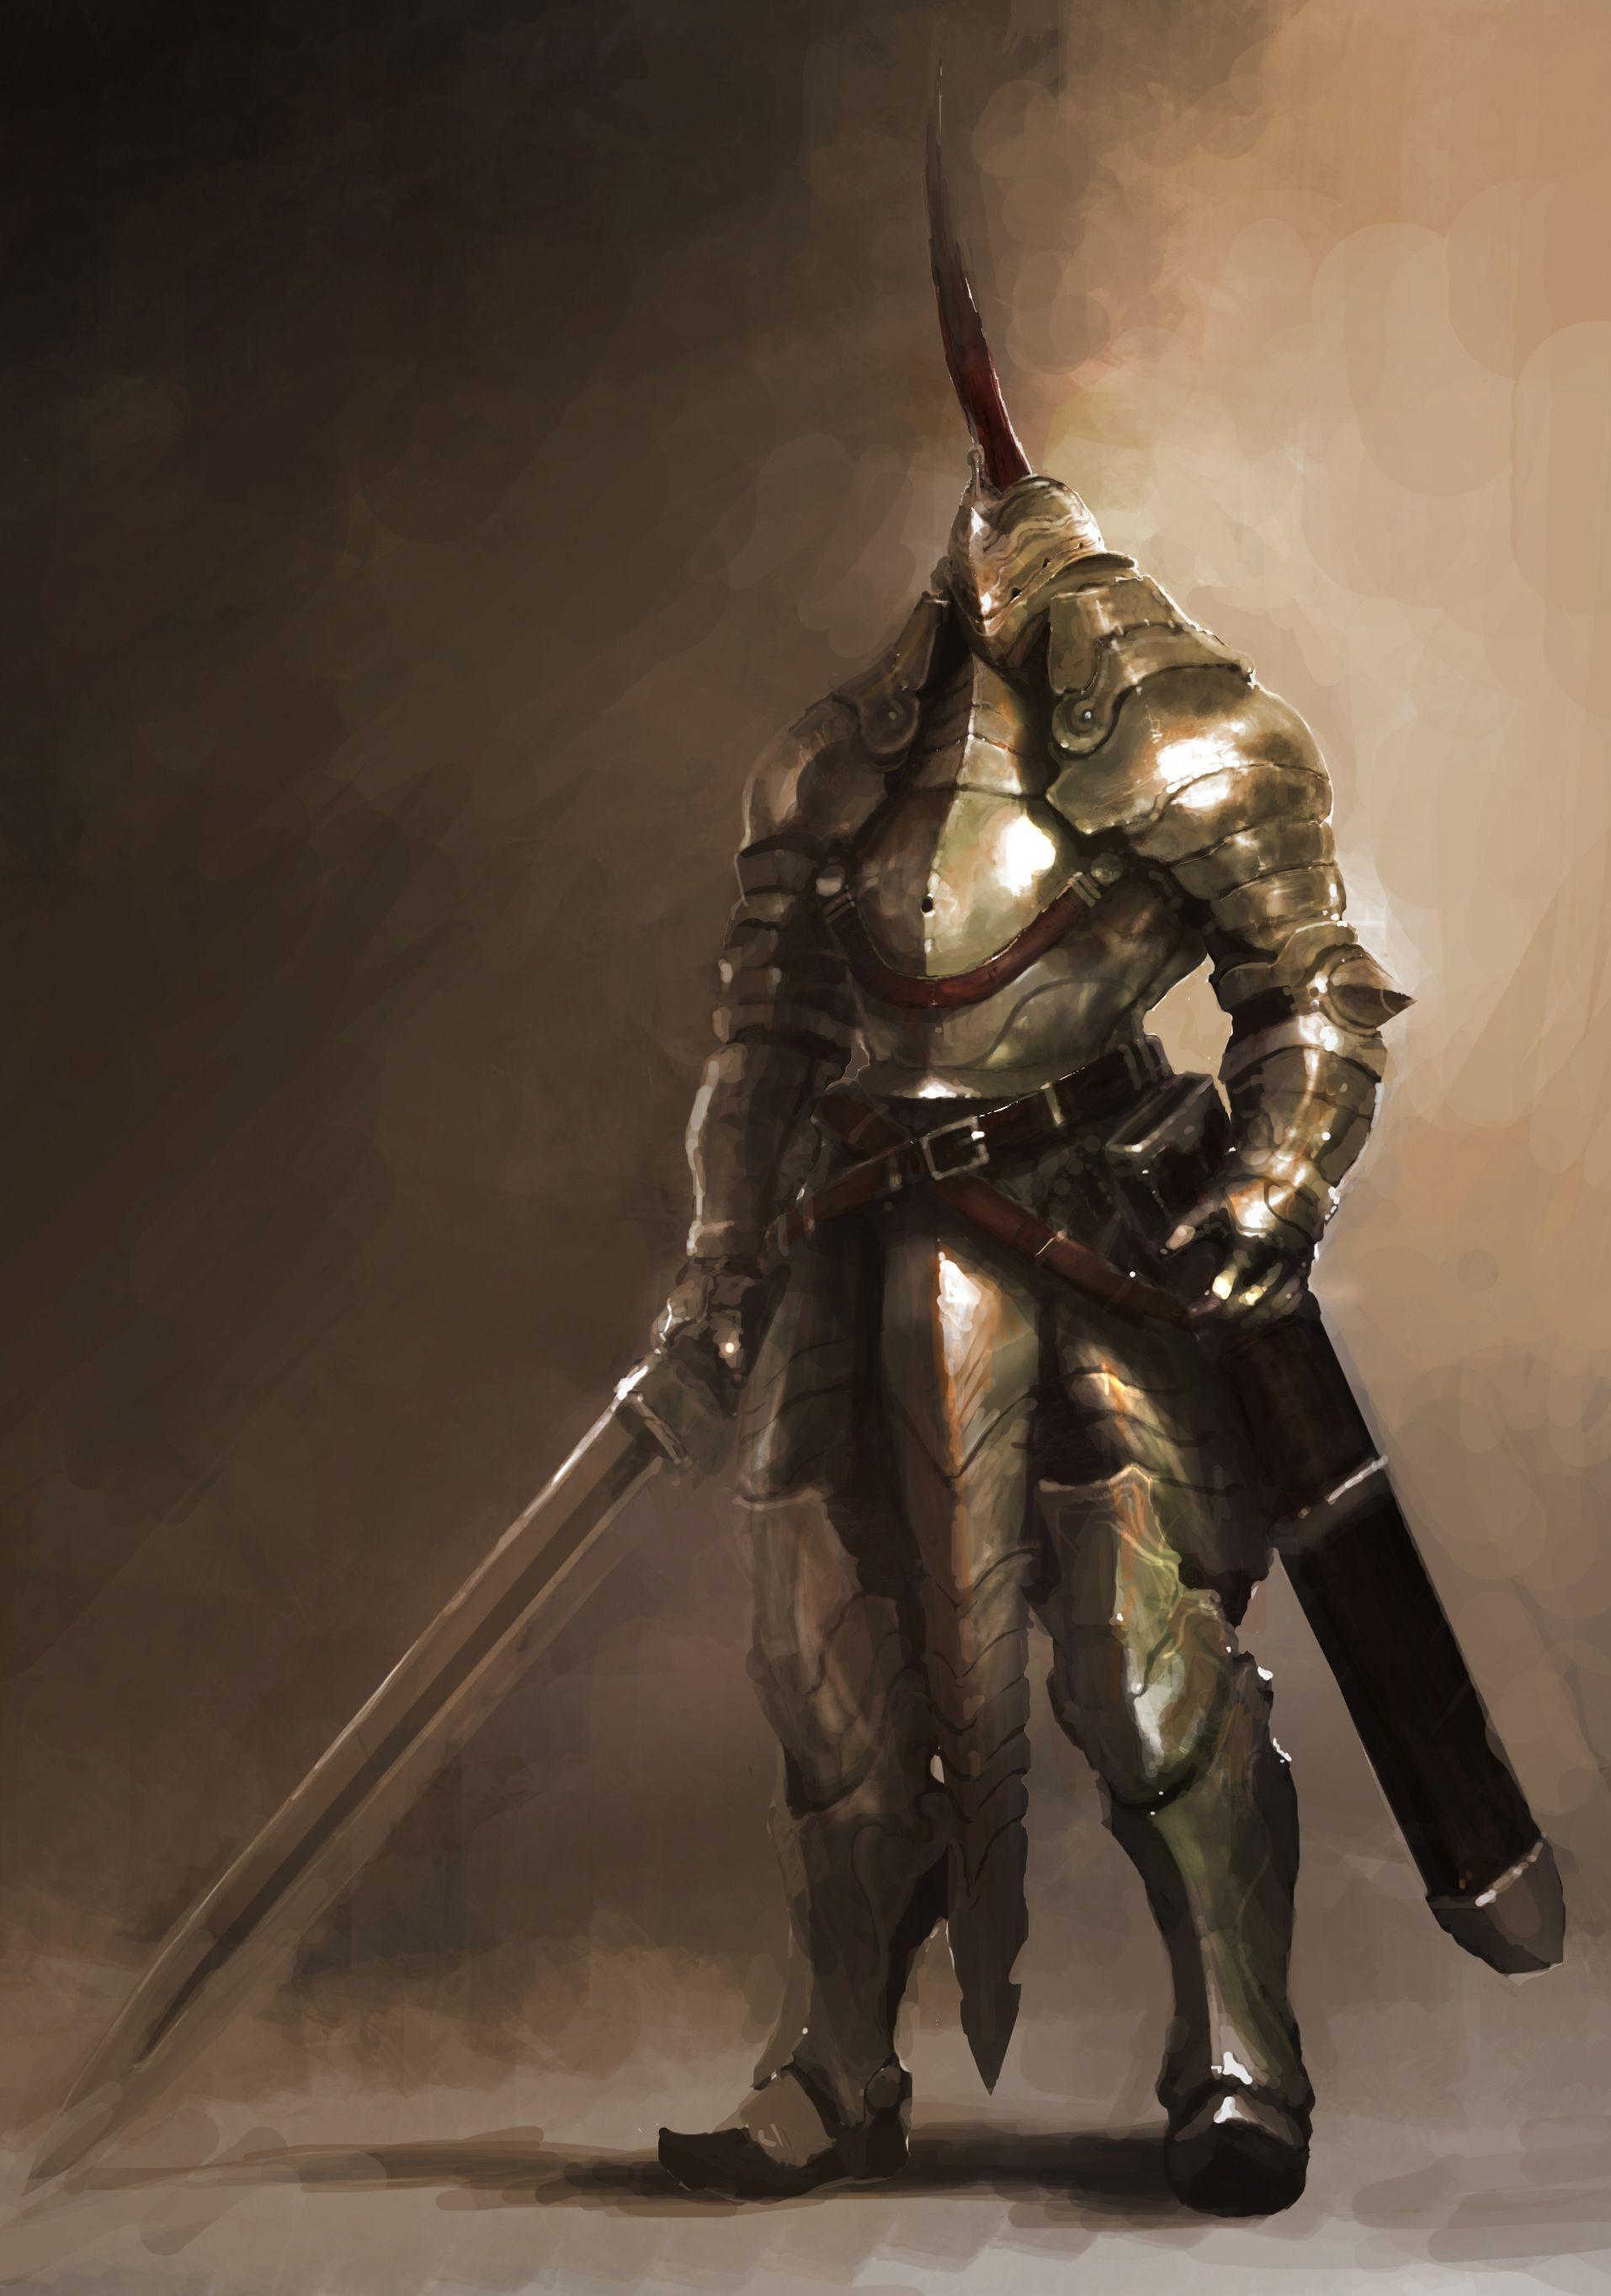 knight concept by artcobain.deviantart.com on @deviantART ...